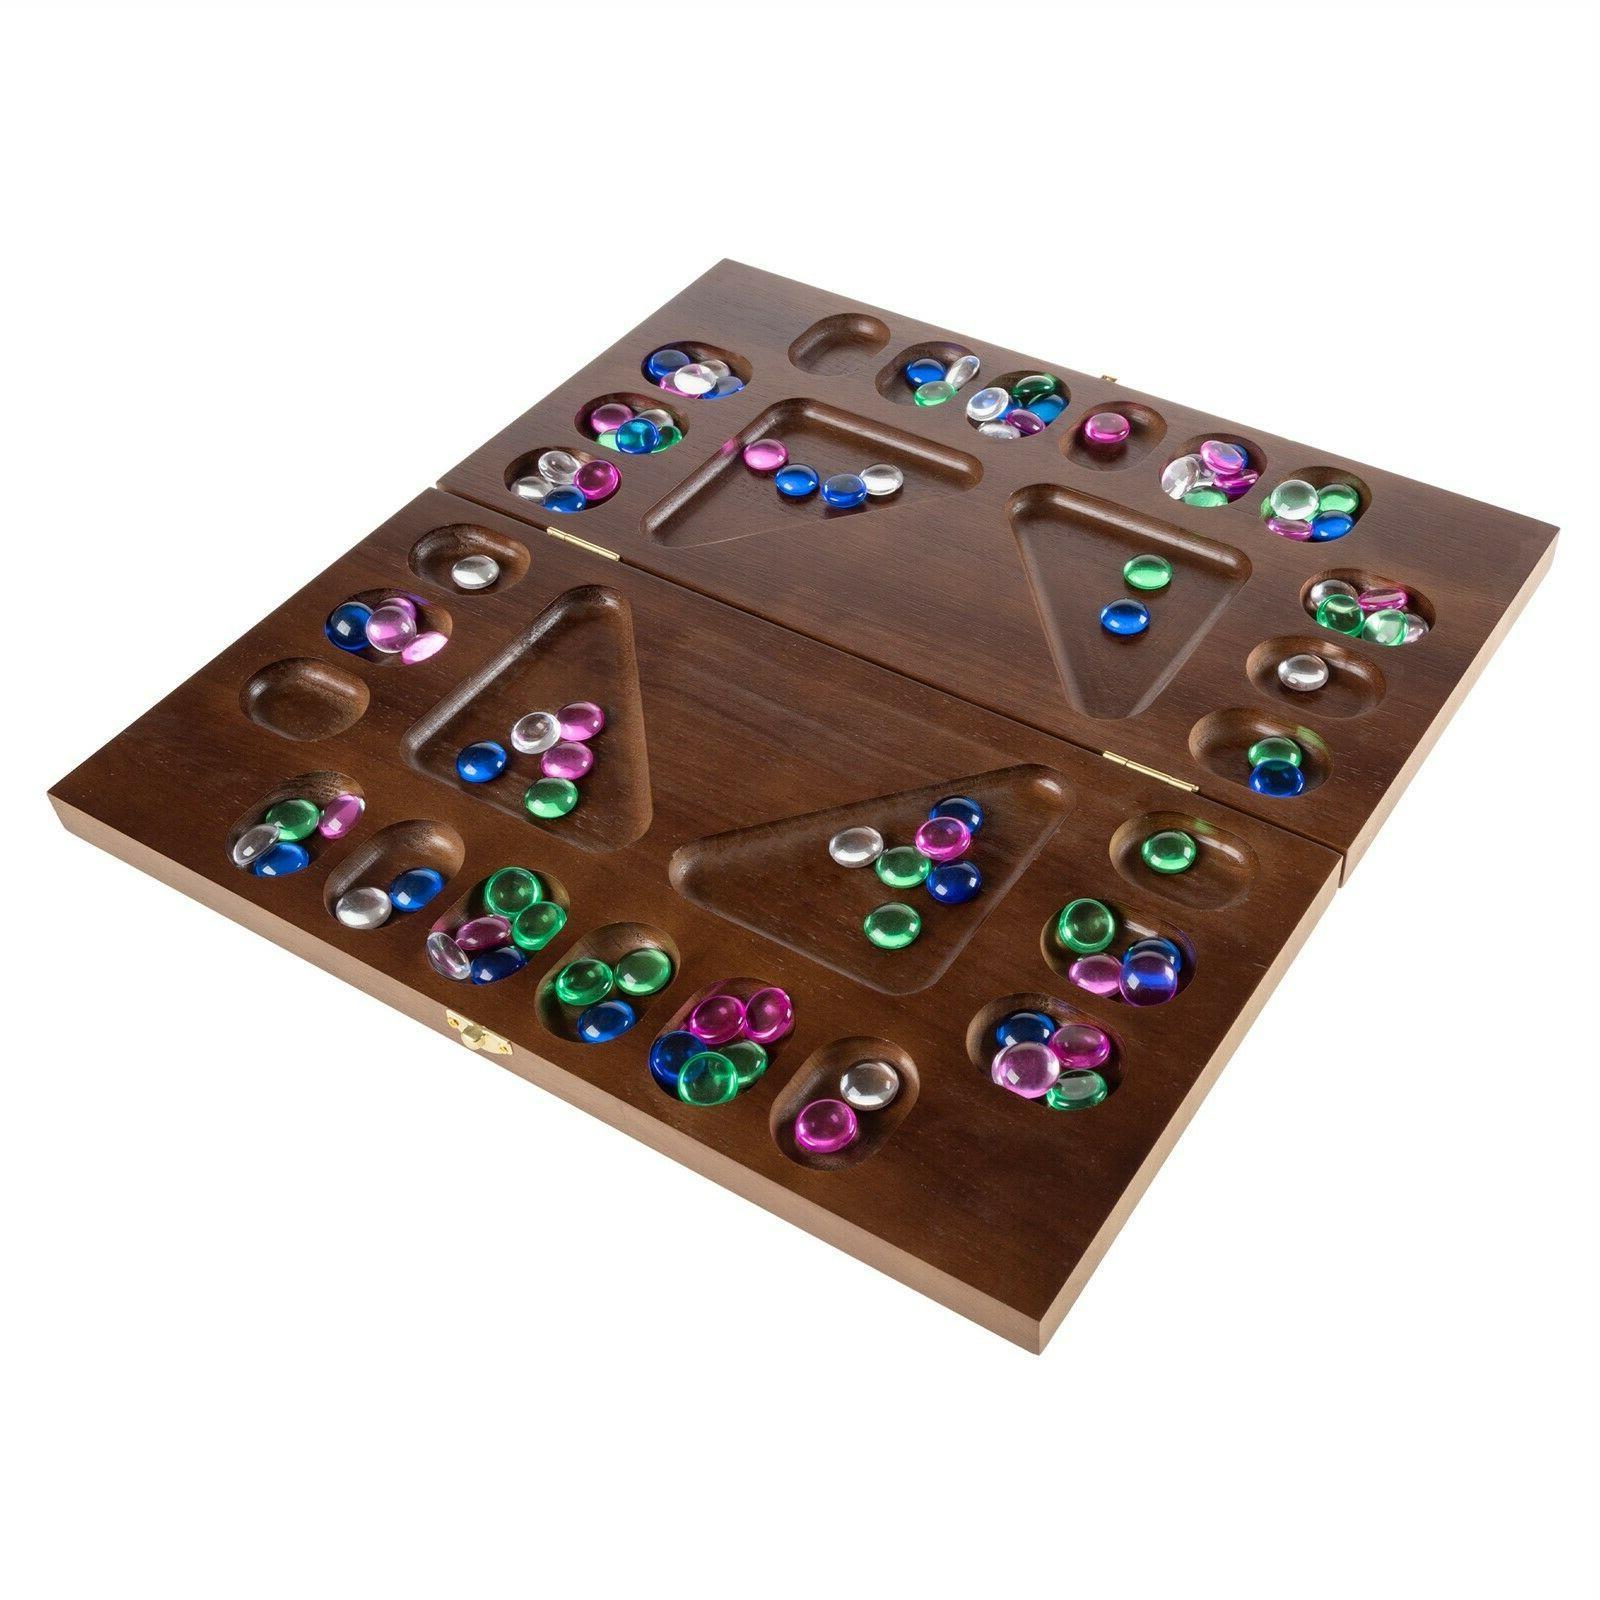 16 in folding wooden mancala game 2